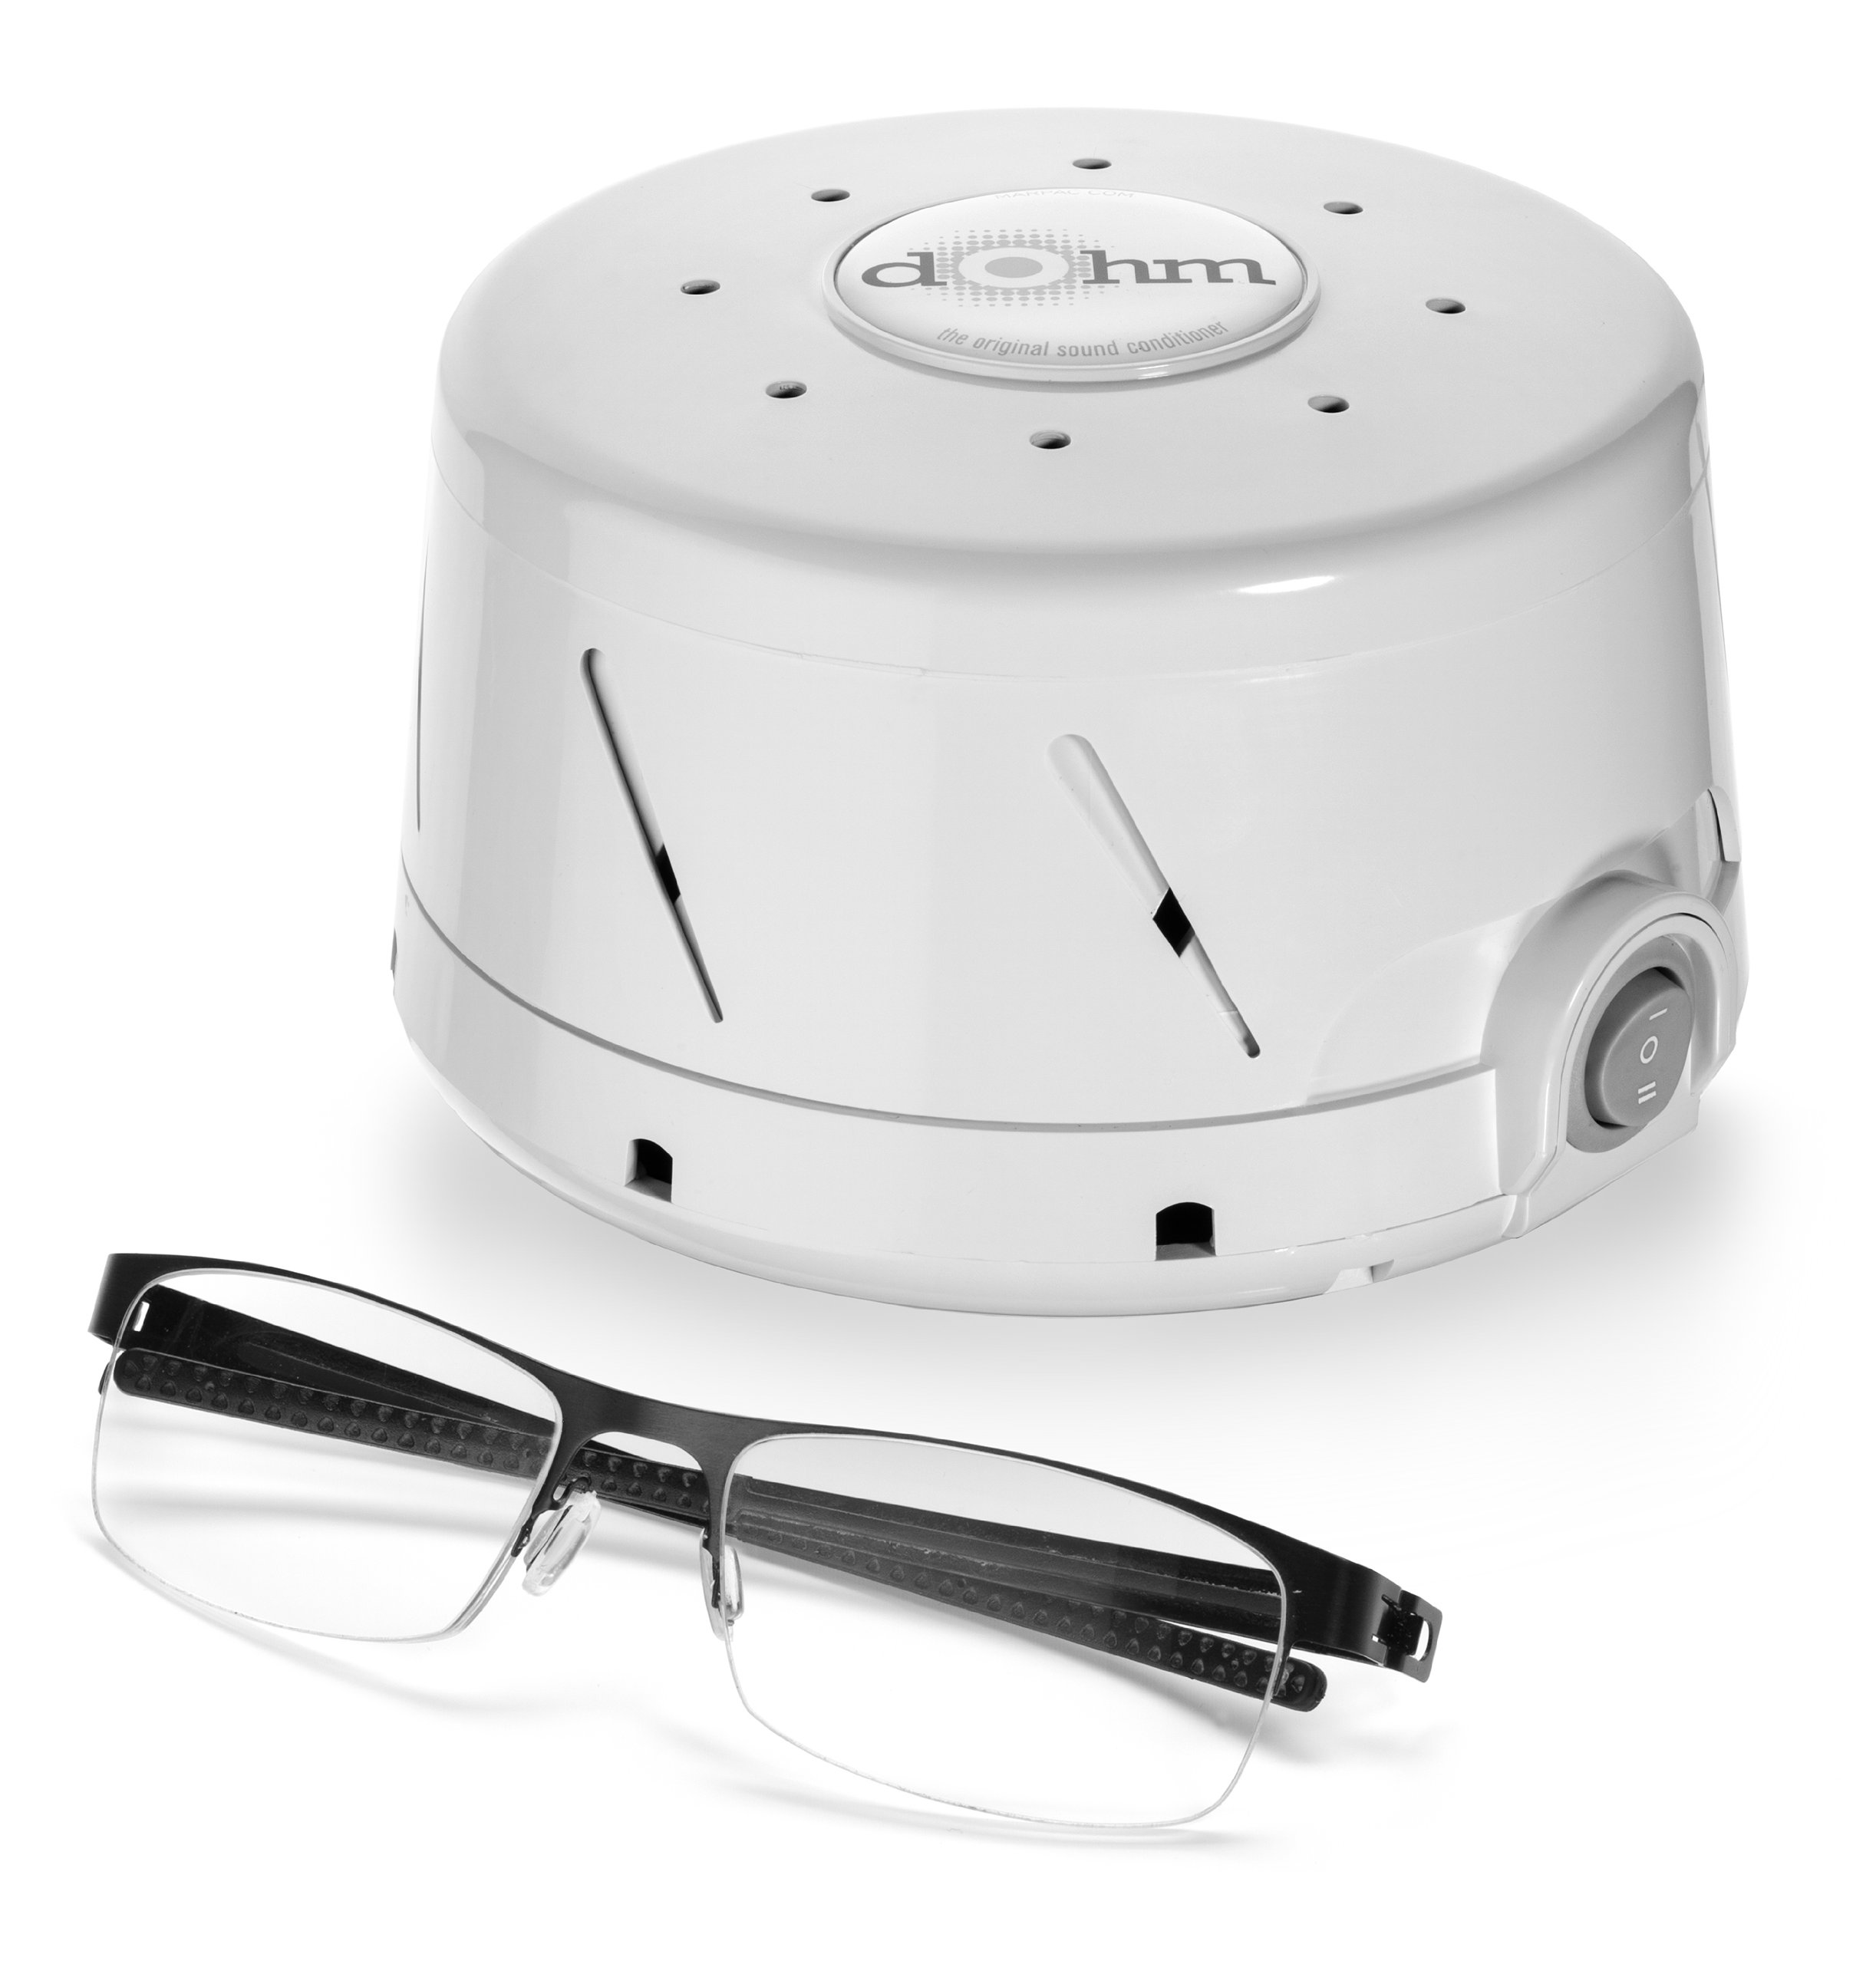 marpac dohm classic white noise sound machine white amazon. Black Bedroom Furniture Sets. Home Design Ideas